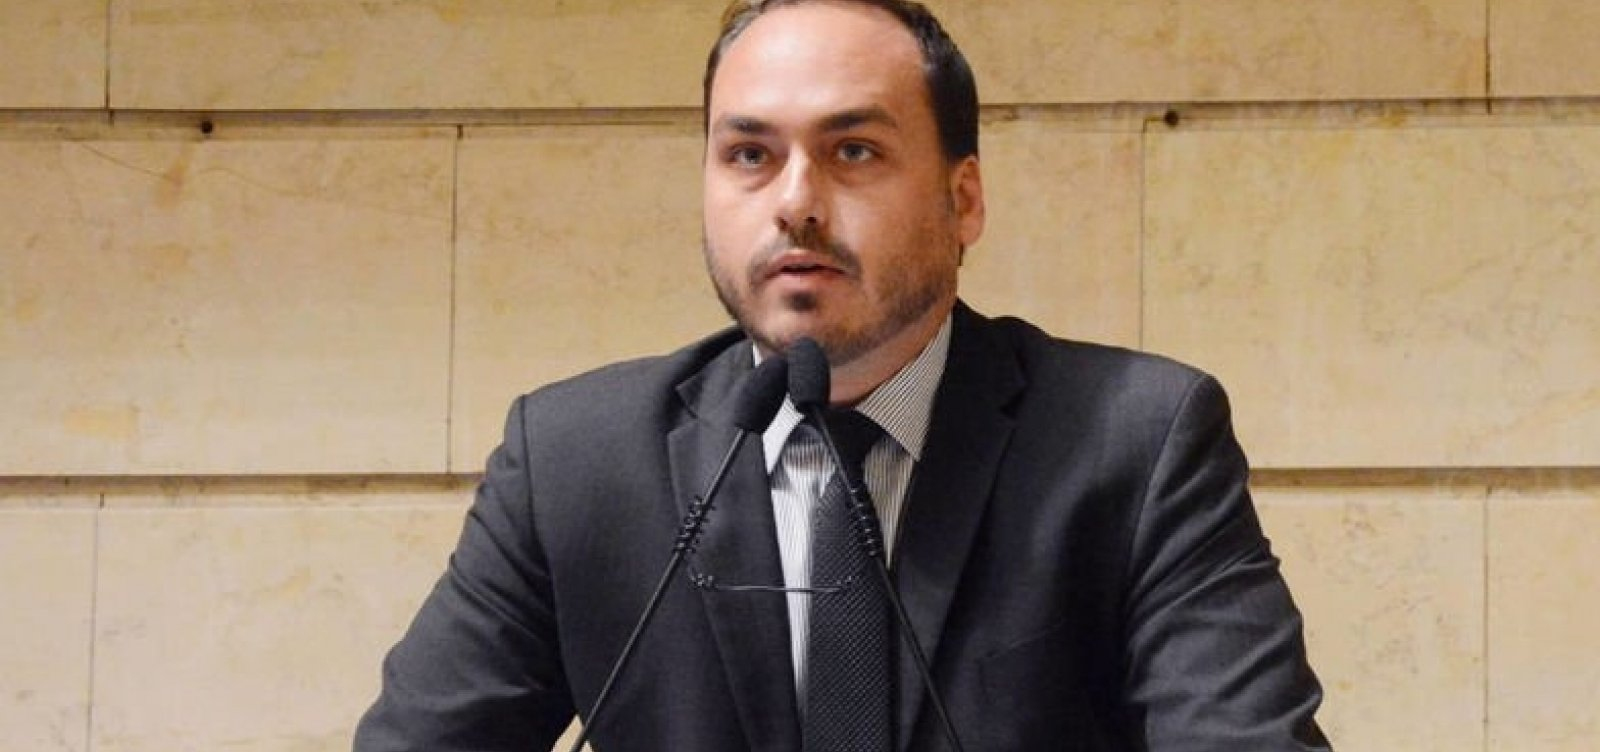 Em vídeo, Bebianno afirma que Jair Bolsonaro pediu por processo contra Carlos